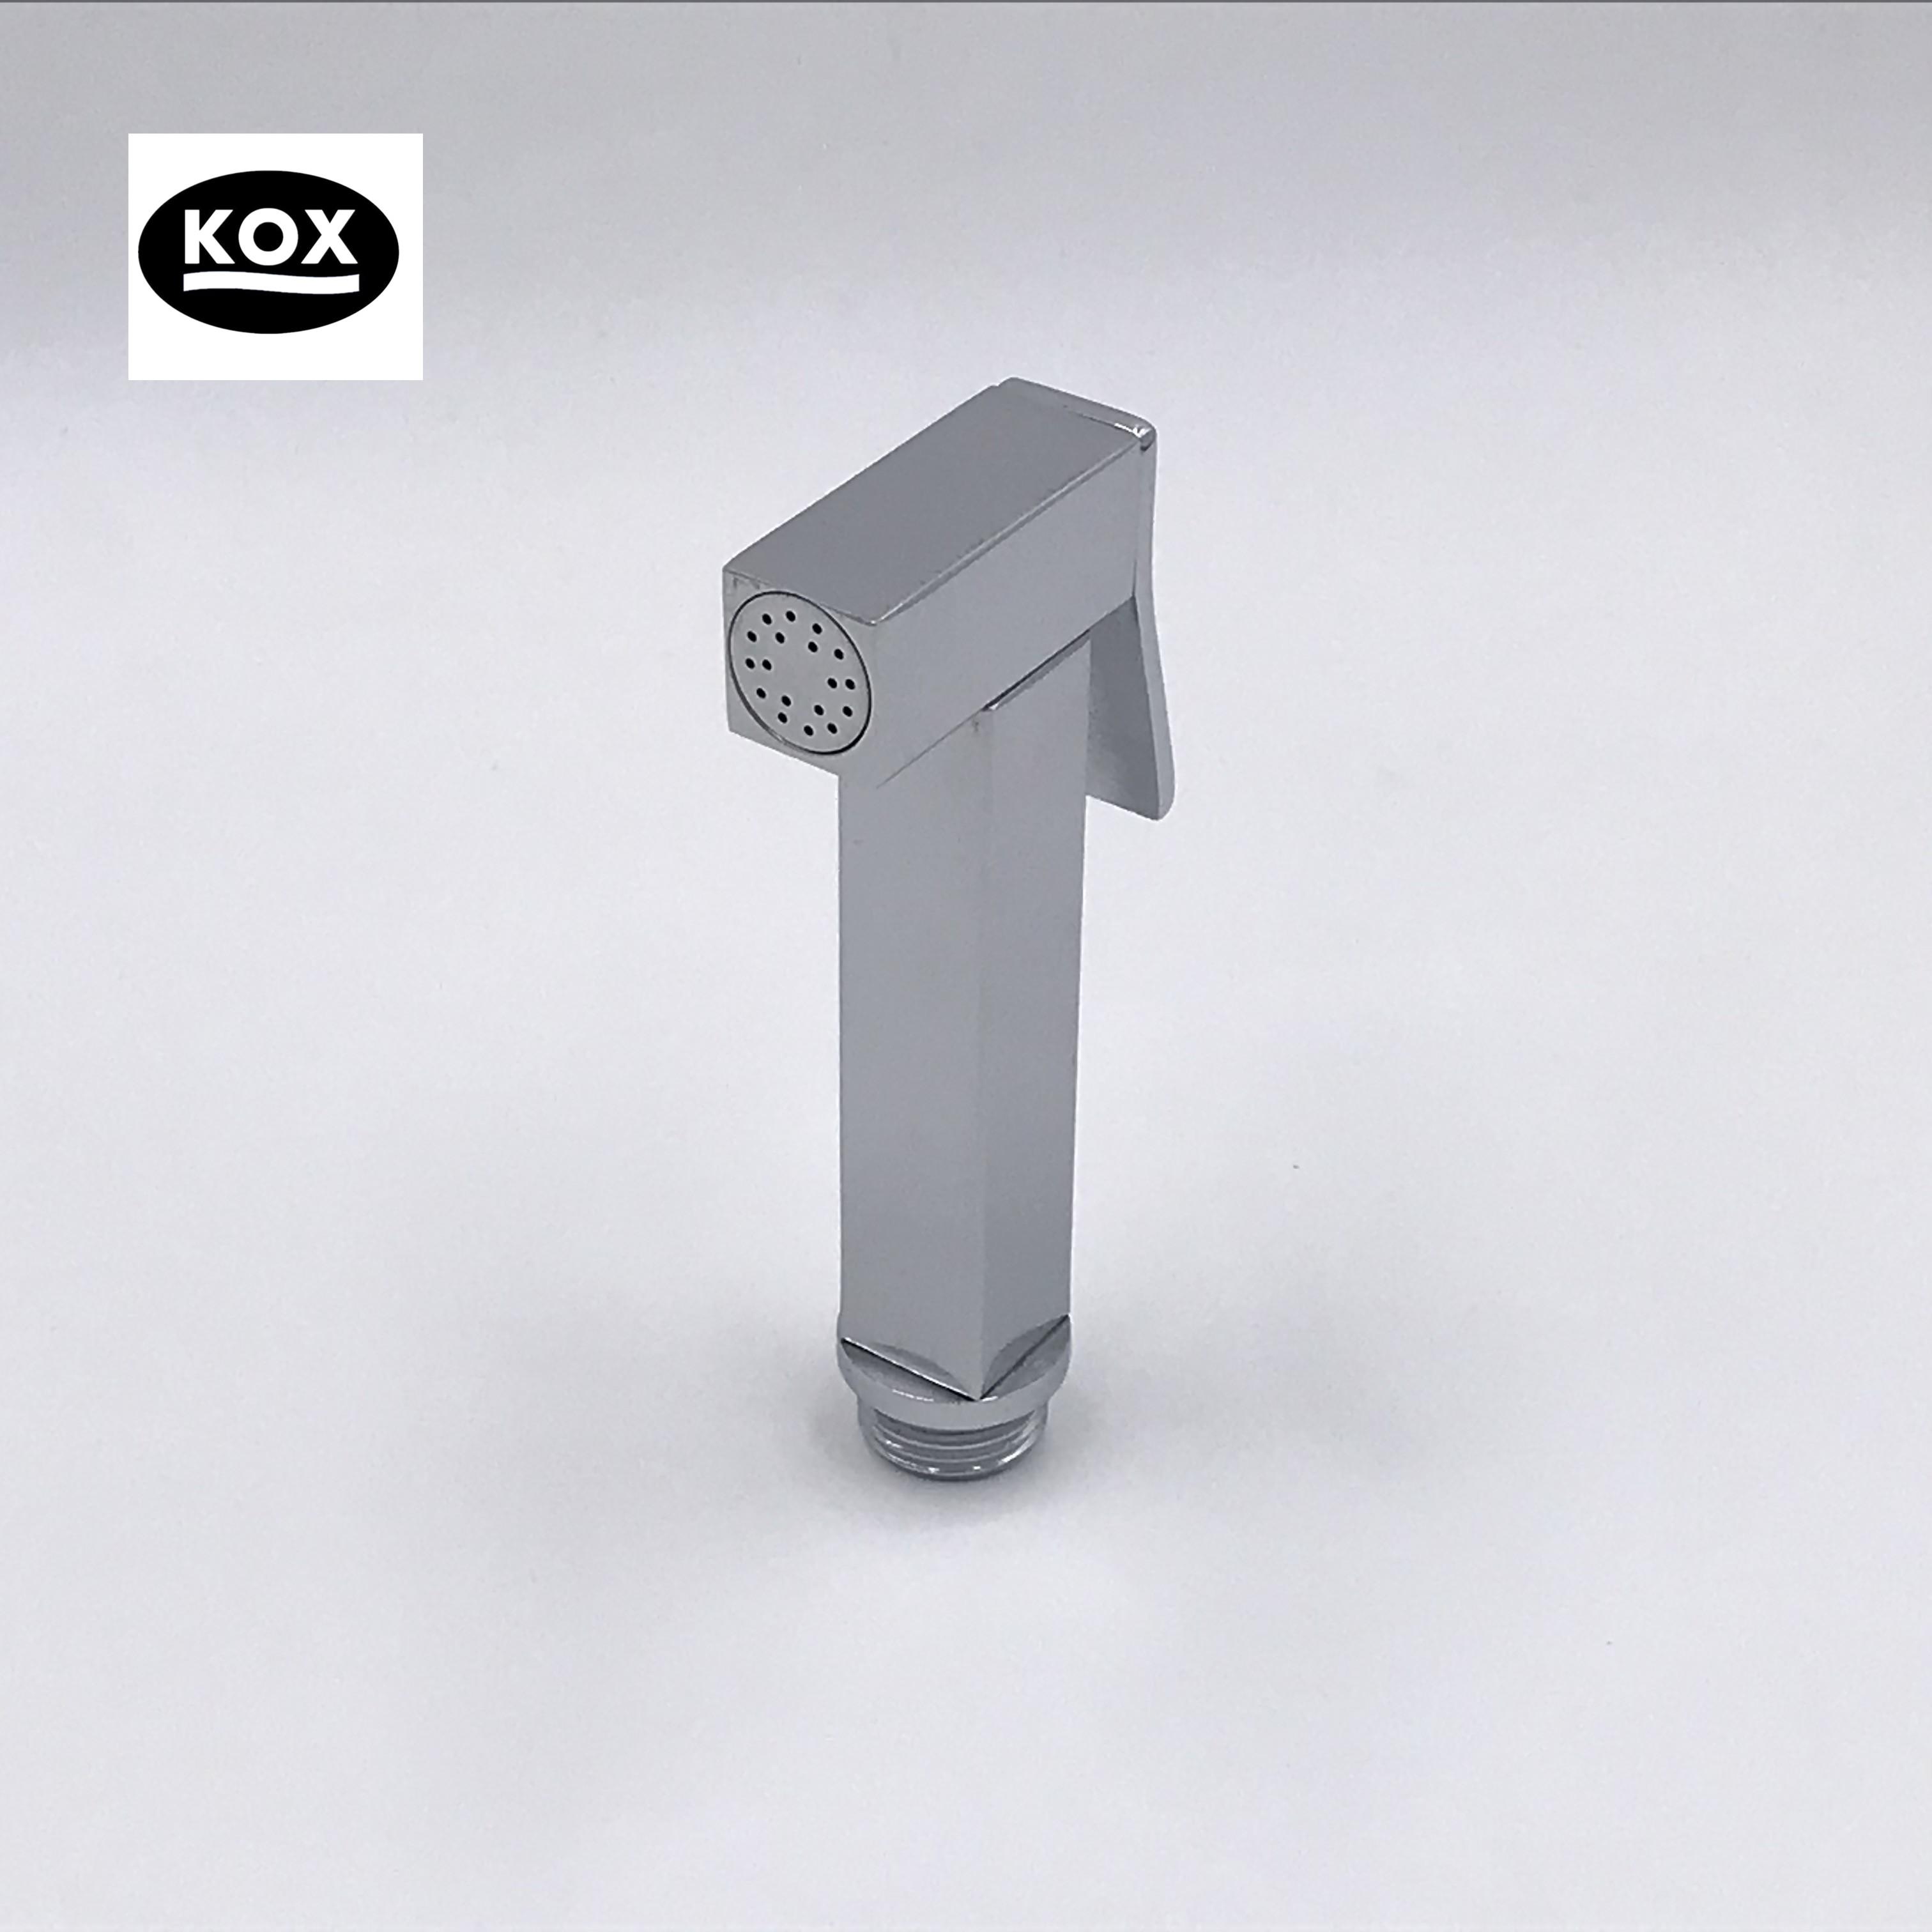 Brass Bathroom Bidet Sprayer Kithand Held Bidet Sprayer Buy Hand Held Bidet Sprayerbidet Sprayer Kitbathroom Bidet Sprayer Kit Product On